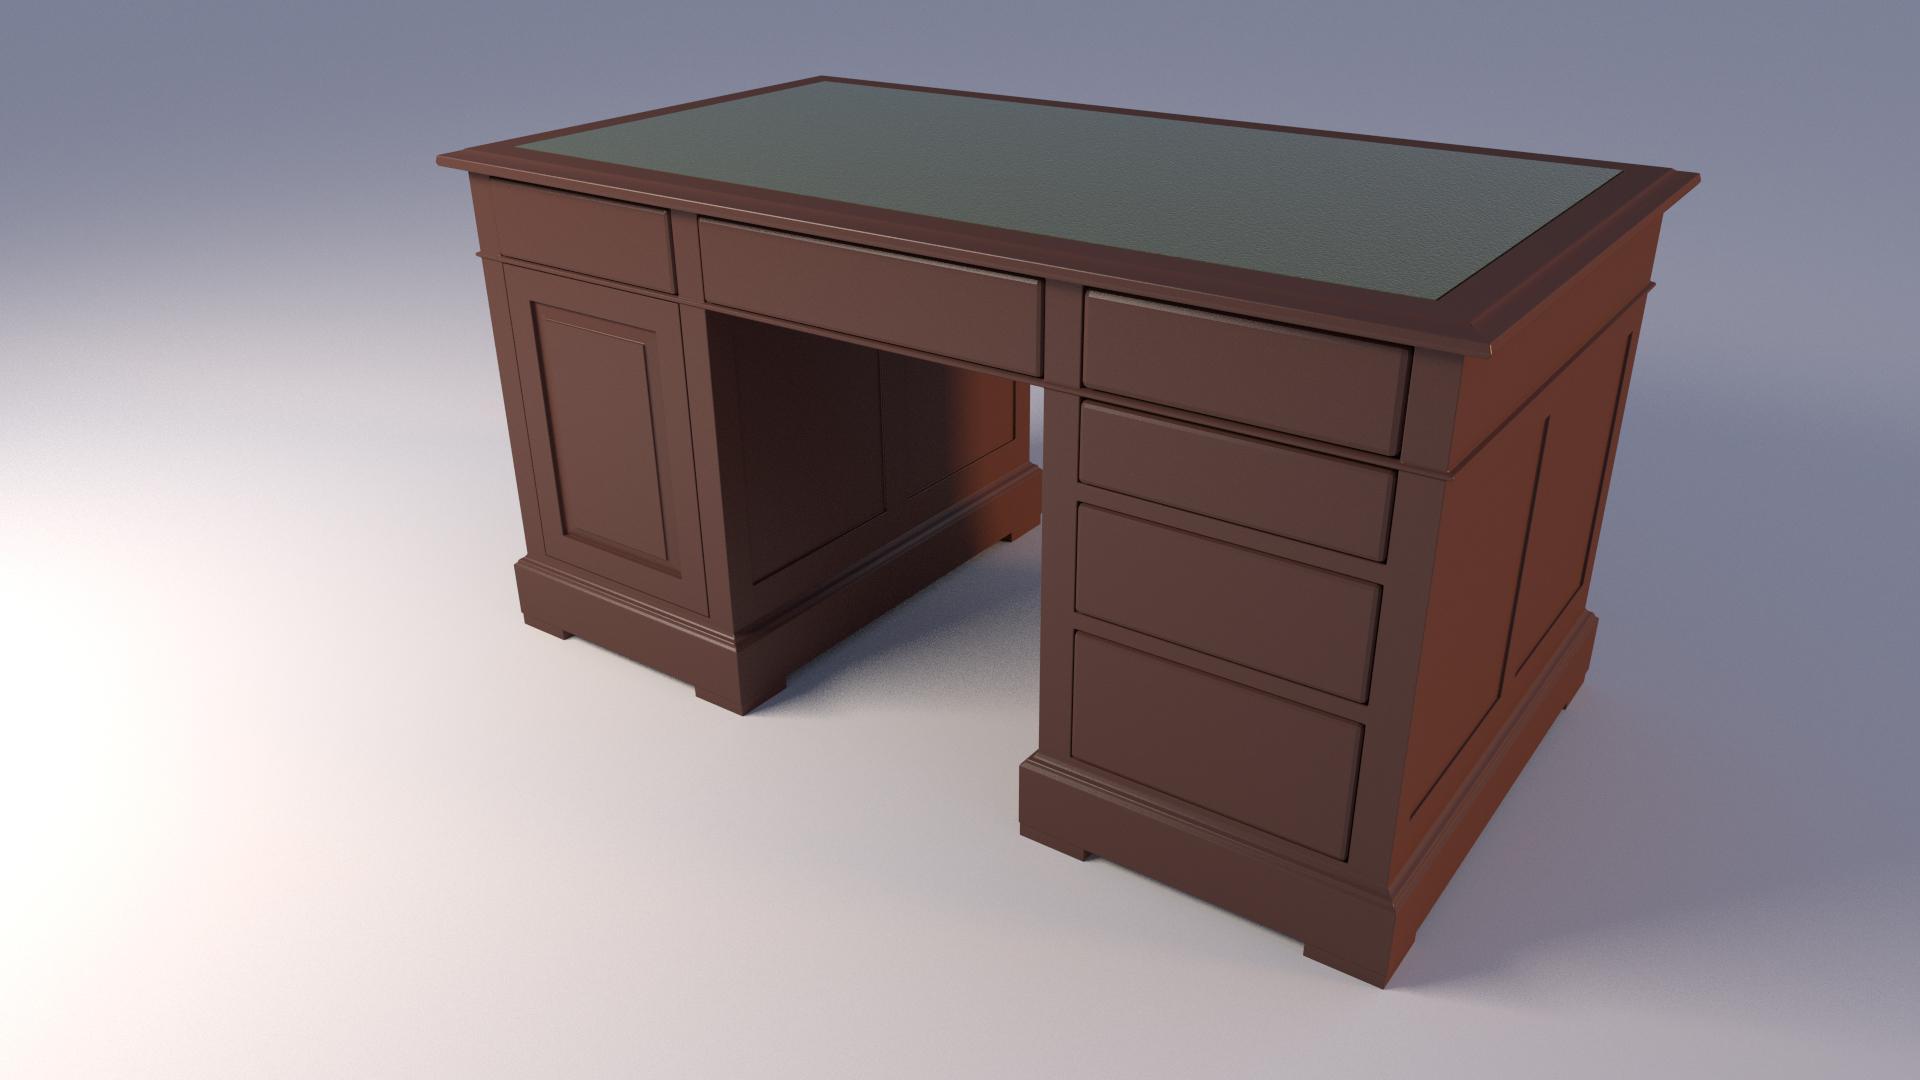 3d model of an american style desk